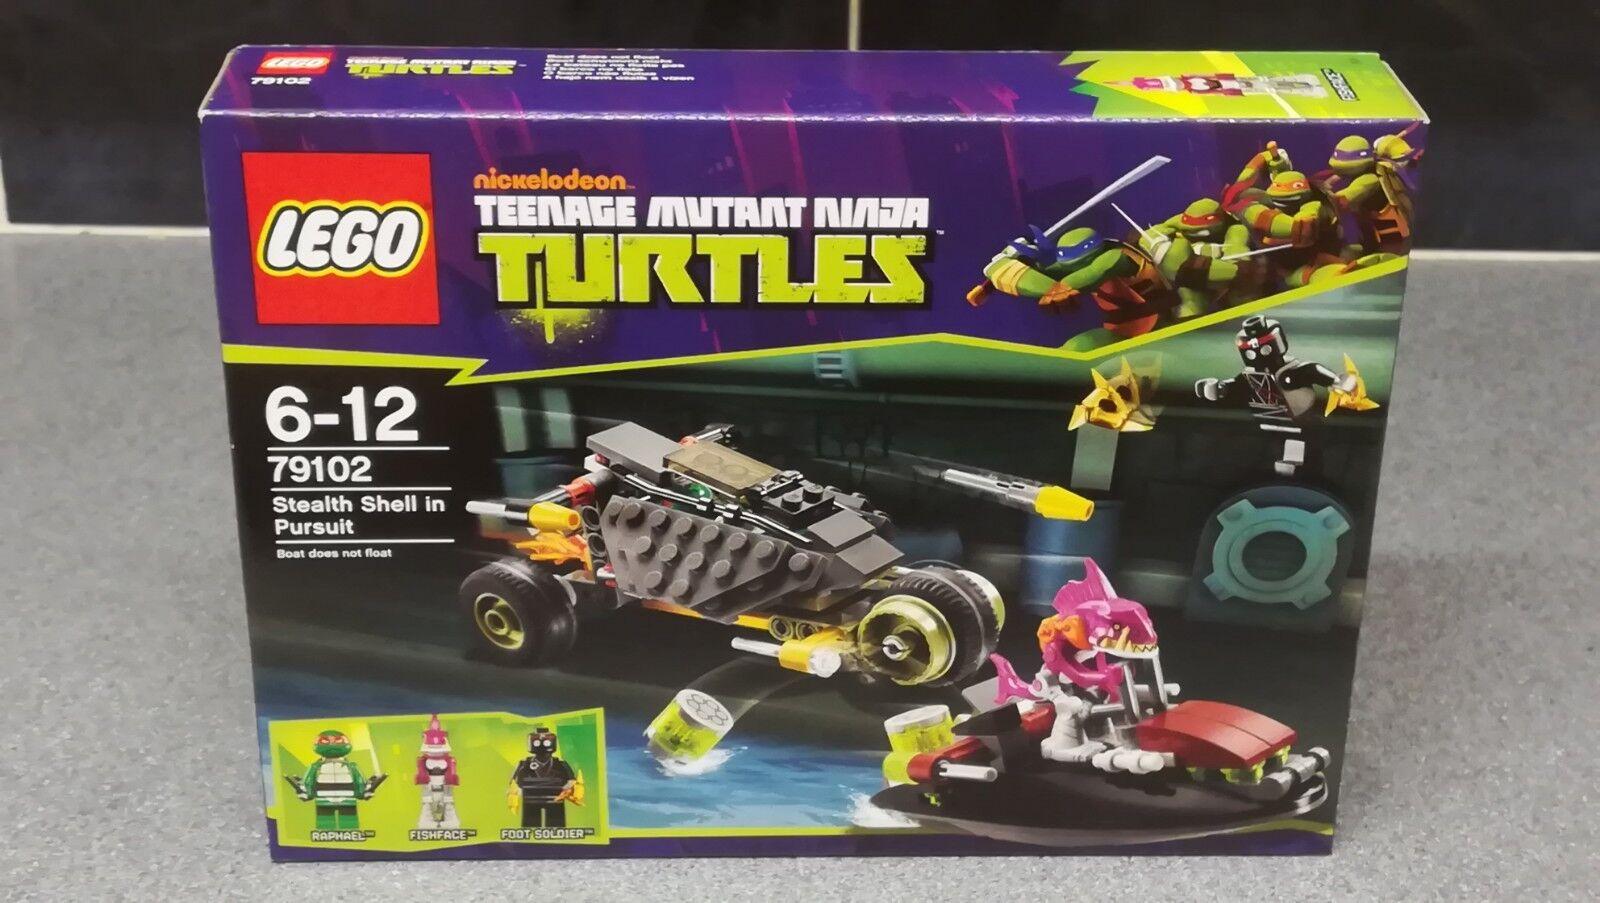 LEGO Teenage Mutant Ninja Turtles 79102 STEALTH SHELL IN PURSUIT - Brand New_2